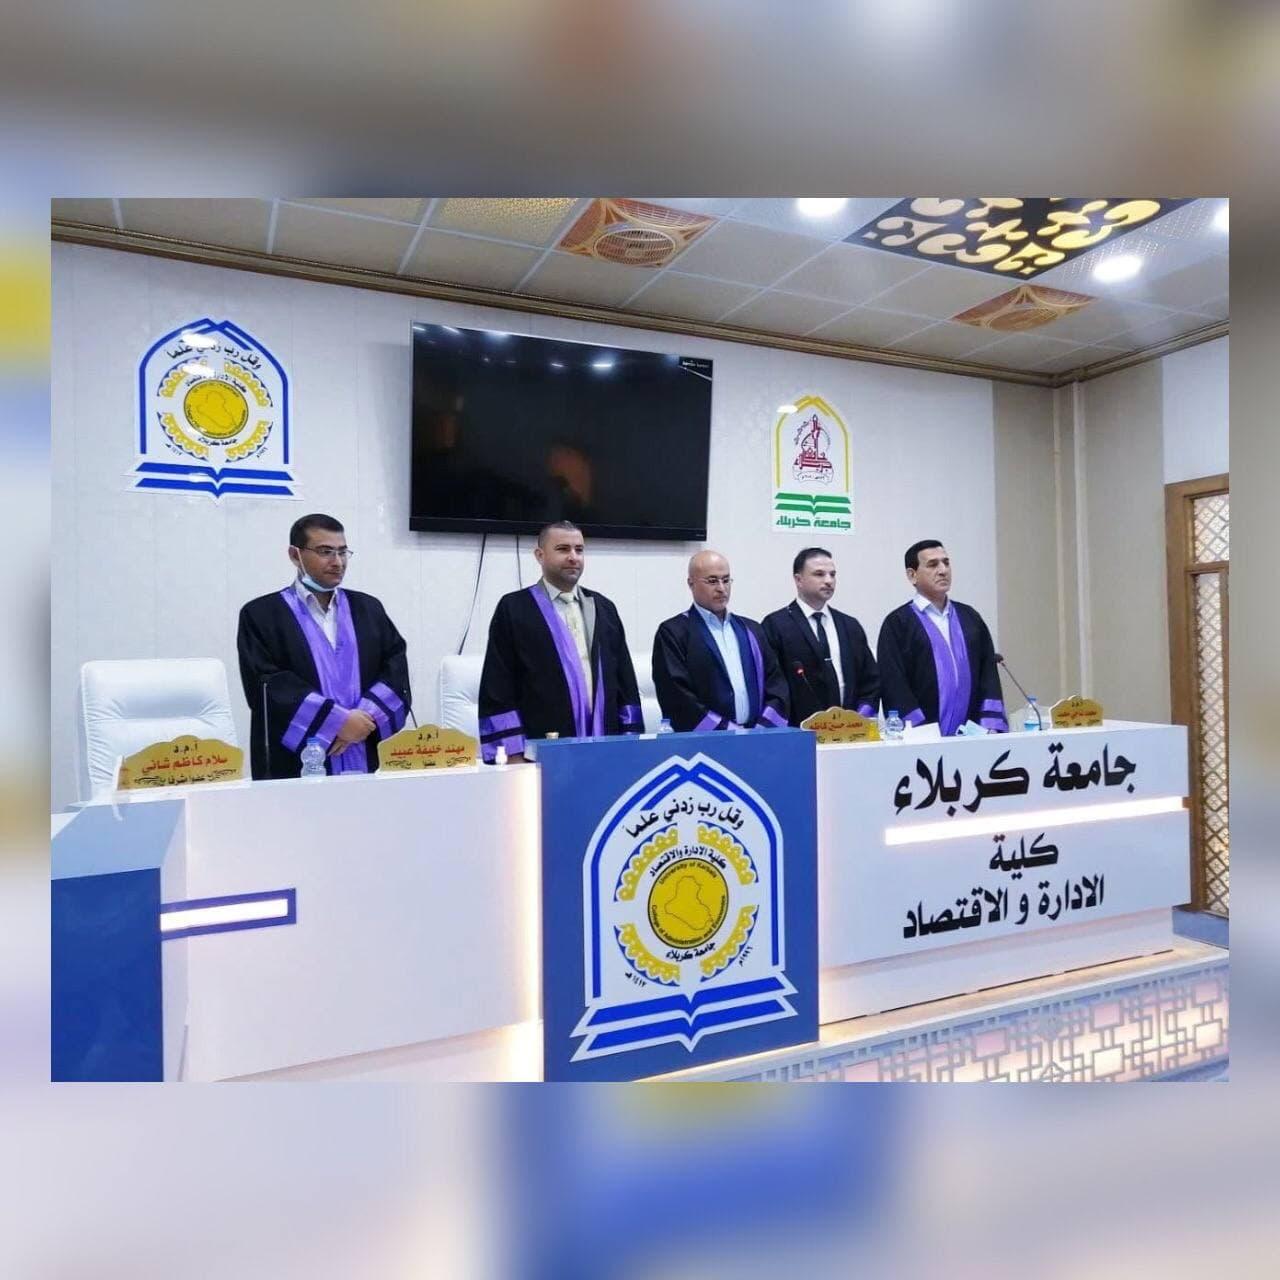 Read more about the article جامعة كربلاء تناقش رسالة ماجستير حول دور اقتصاد الظل في النمو الاقتصادي